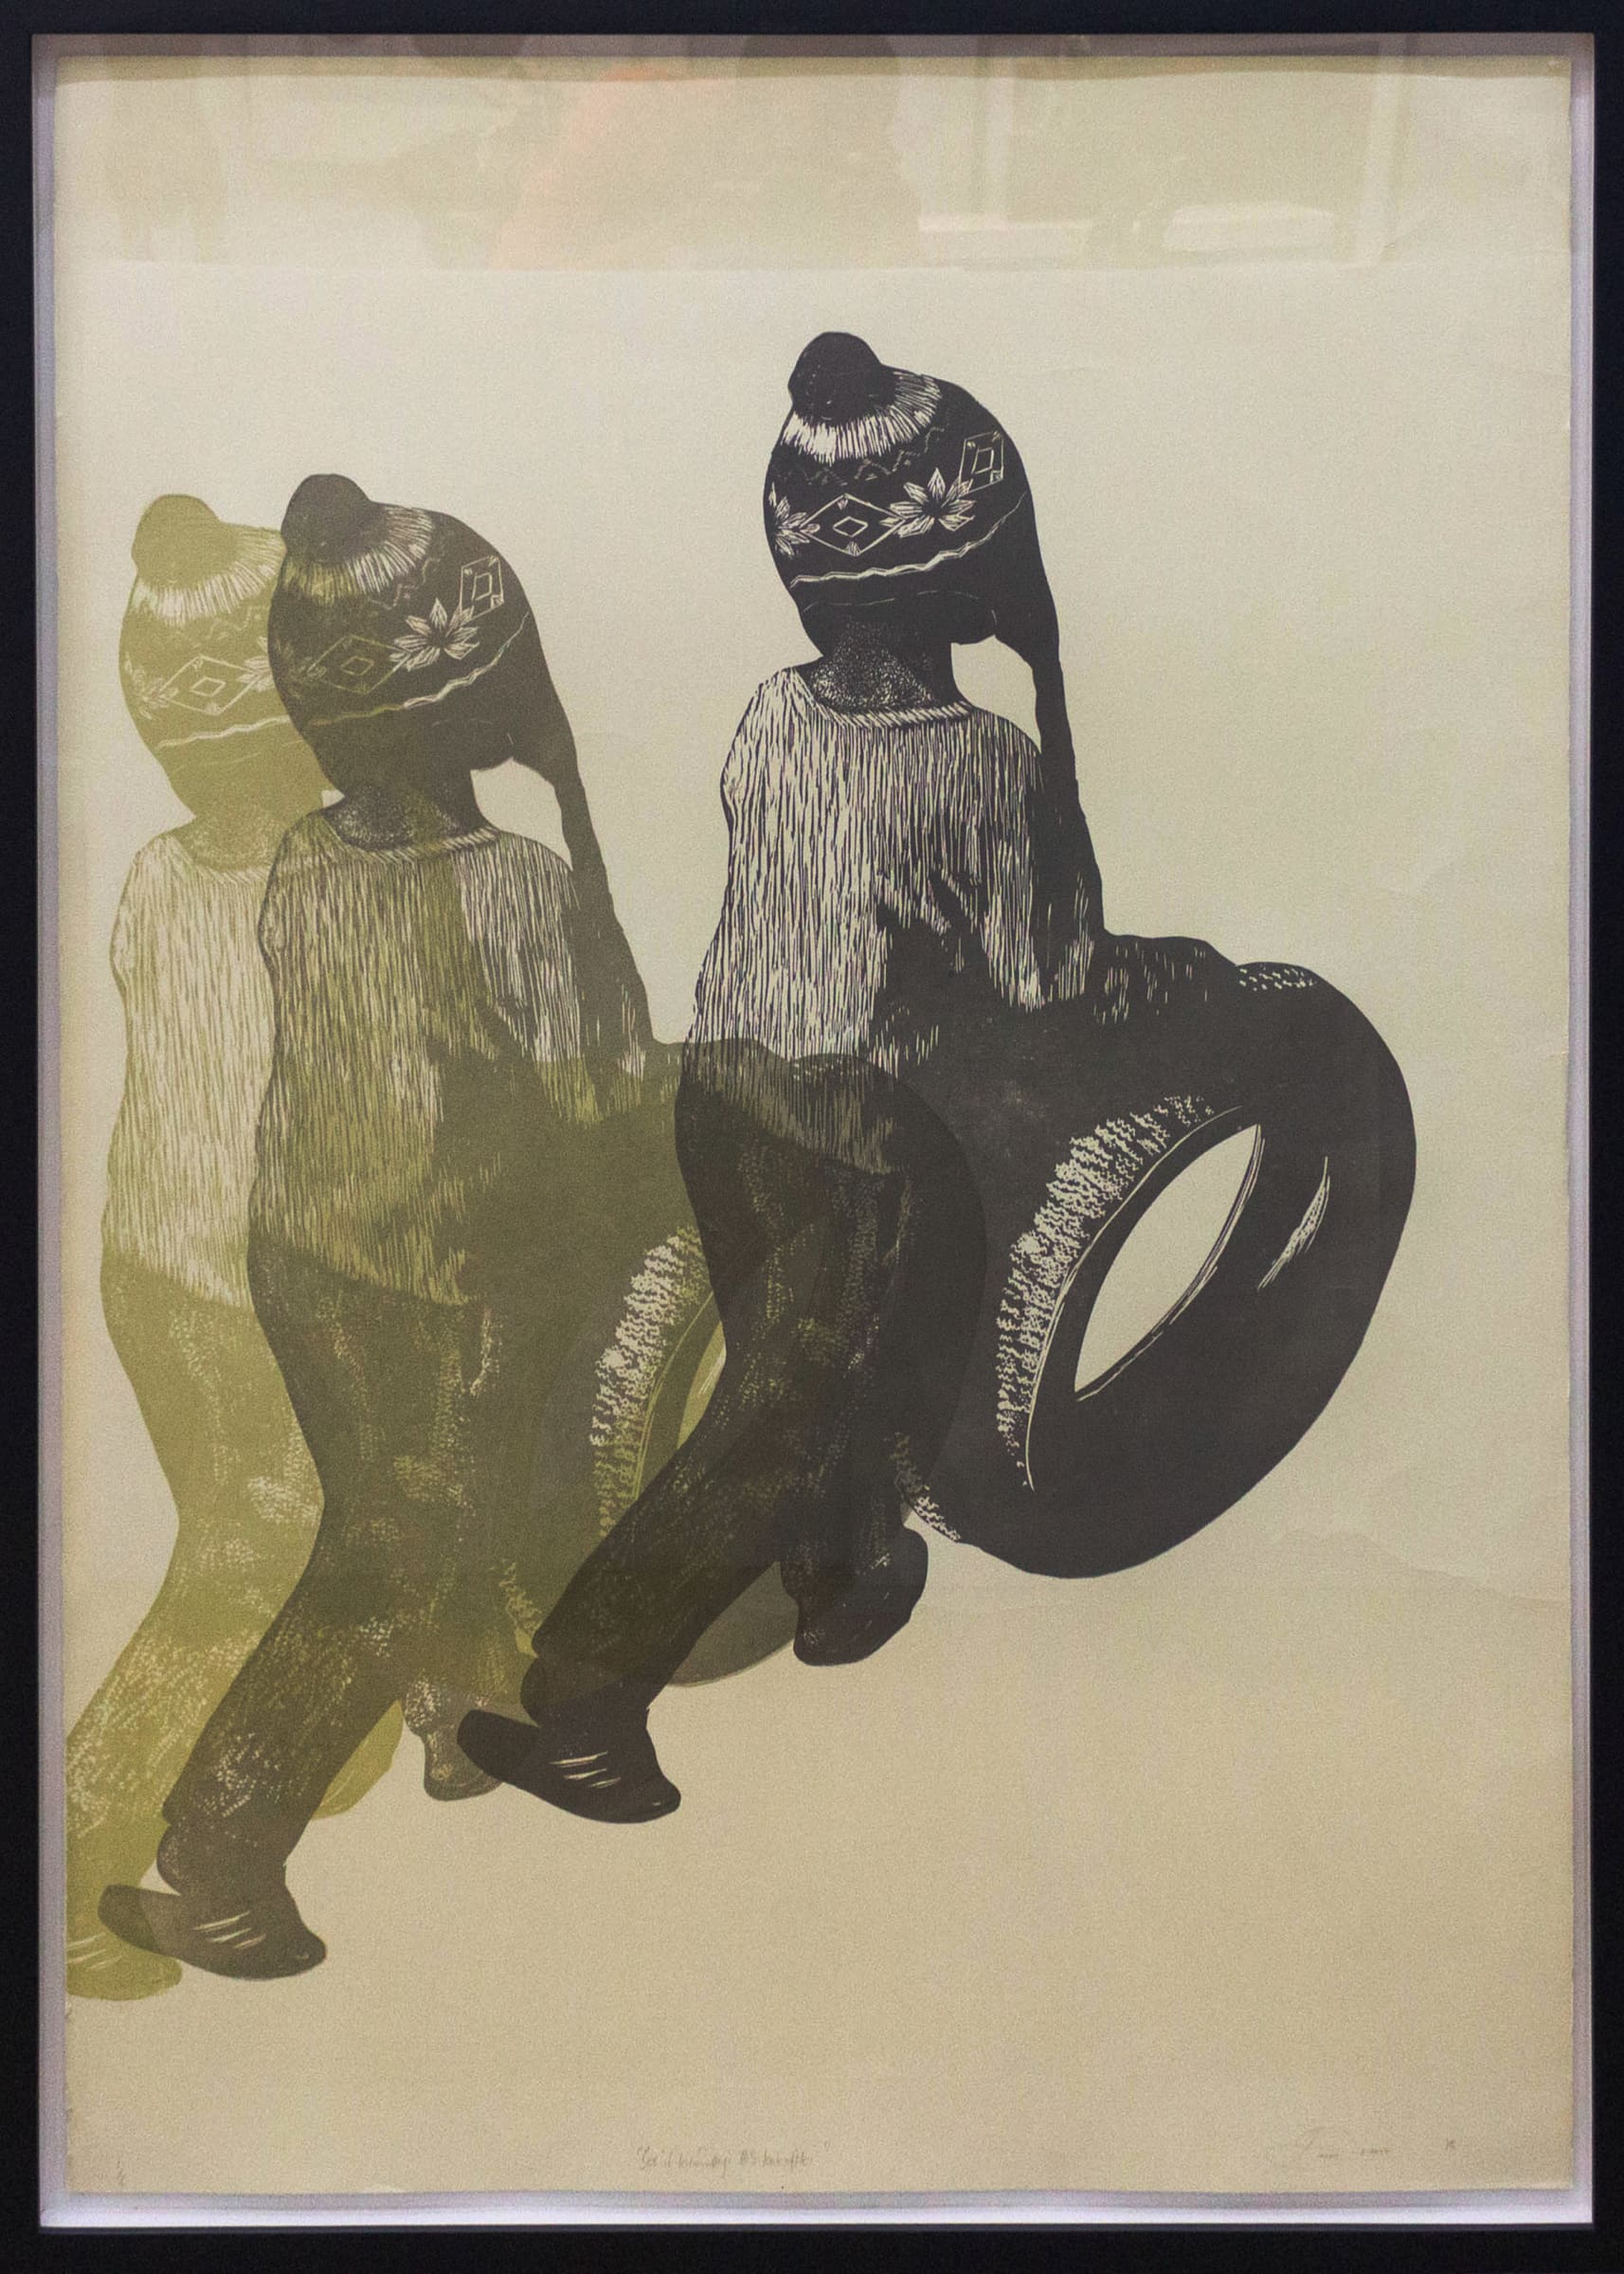 <span class=&#34;link fancybox-details-link&#34;><a href=&#34;/artworks/categories/66/3109-lindo-zwane-ses-fikile-ayi-asikakafiki-2015/&#34;>View Detail Page</a></span><div class=&#34;artist&#34;><strong>Lindo Zwane</strong></div> <div class=&#34;title&#34;><em>Ses' Fikile Ayi Asikakafiki</em>, 2015</div> <div class=&#34;medium&#34;>Linocut</div> <div class=&#34;dimensions&#34;>100cm x 70cm (106.5cm x 76.6cm framed)</div> <div class=&#34;edition_details&#34;>1/6</div><div class=&#34;price&#34;>R7,800.00</div>